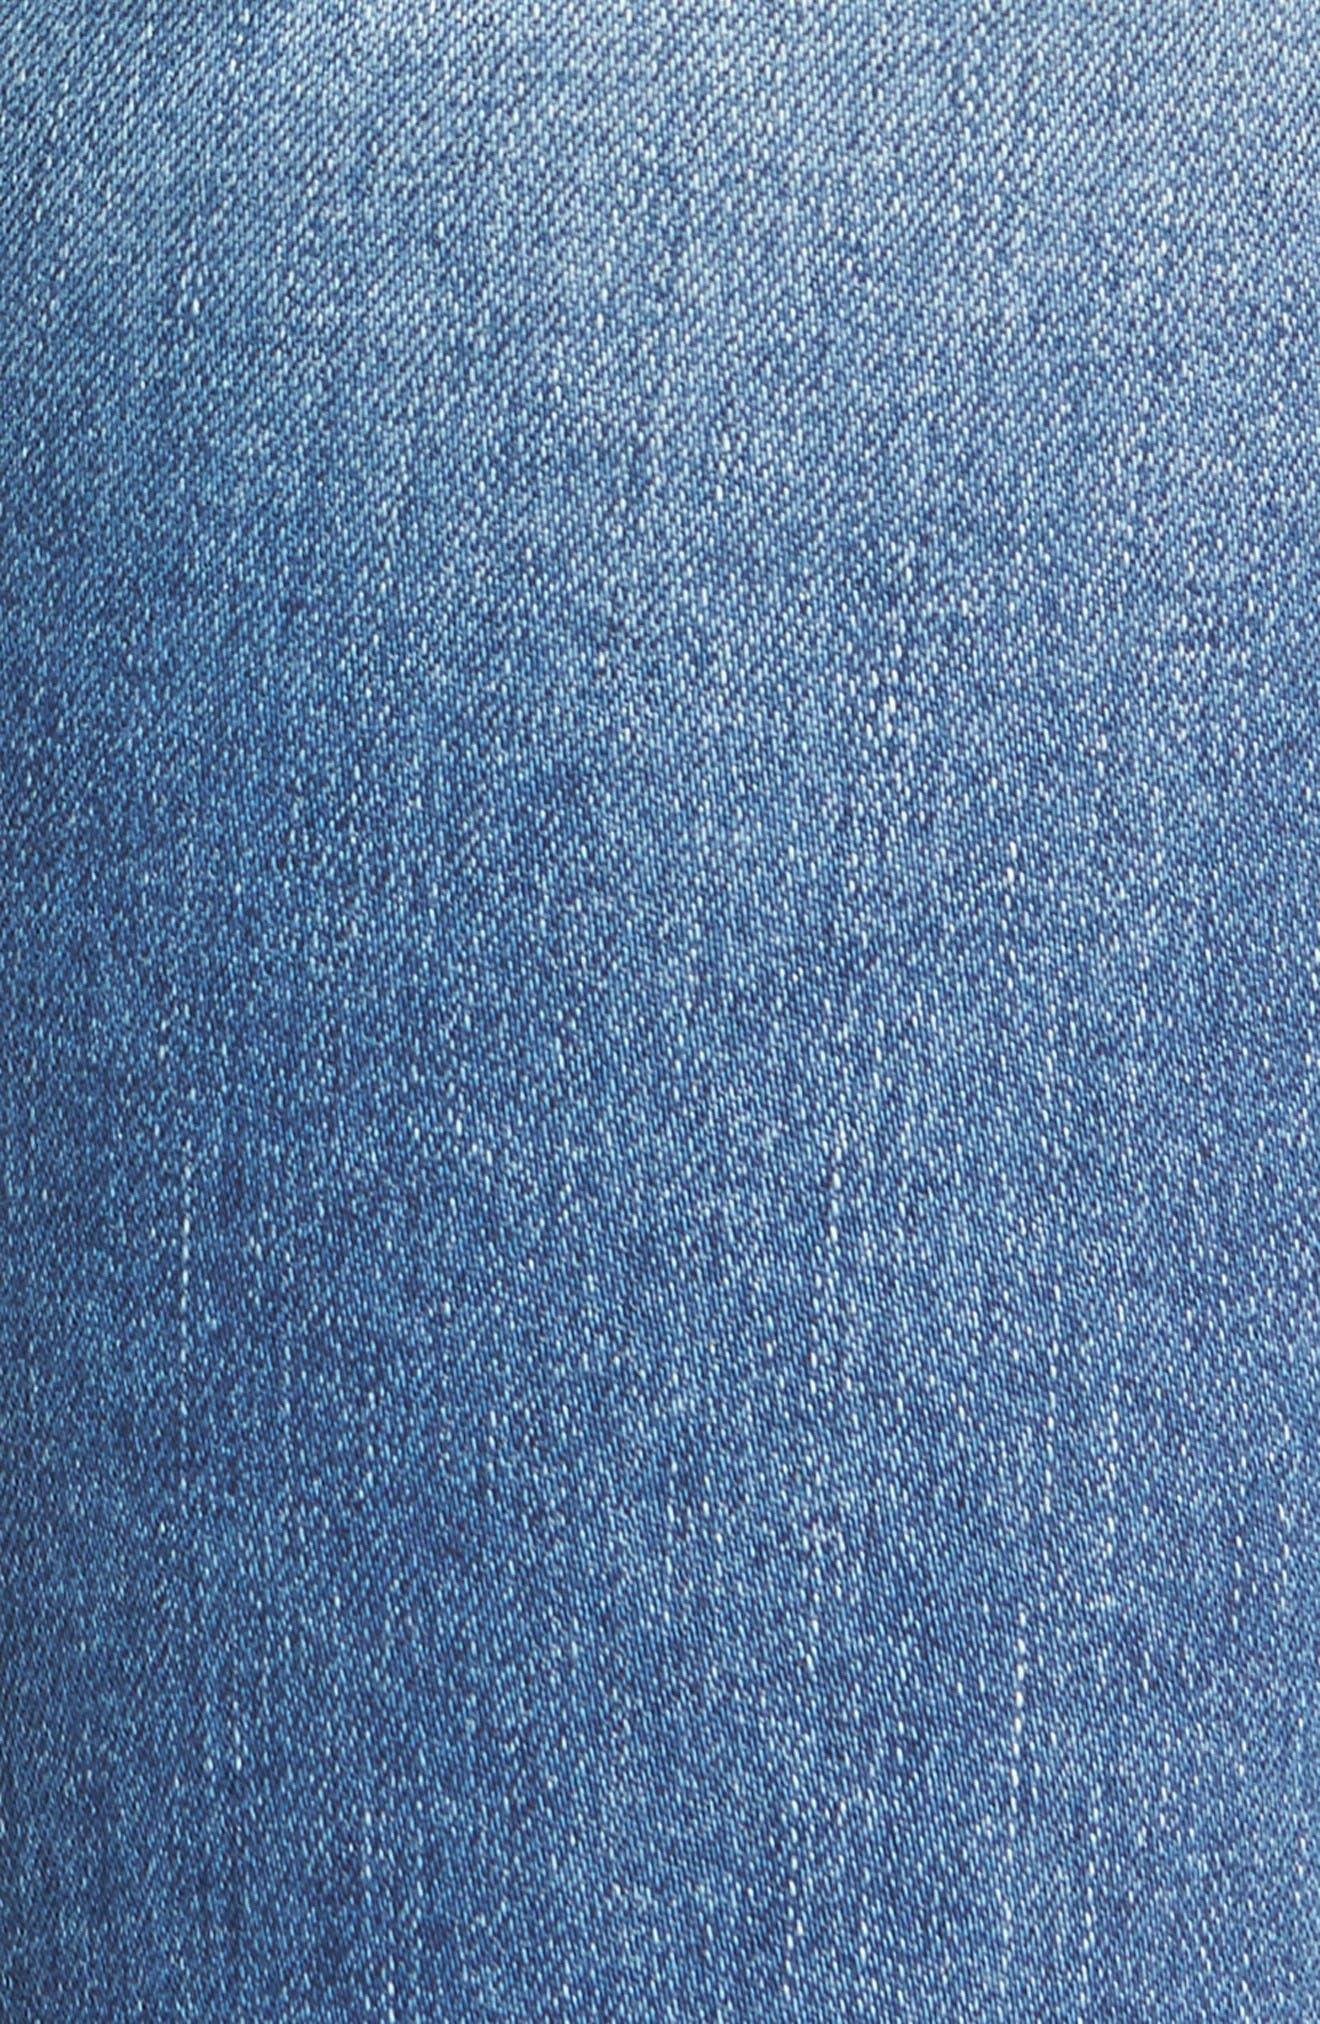 Tilda Crop Straight Leg Jeans,                             Alternate thumbnail 5, color,                             Impulse